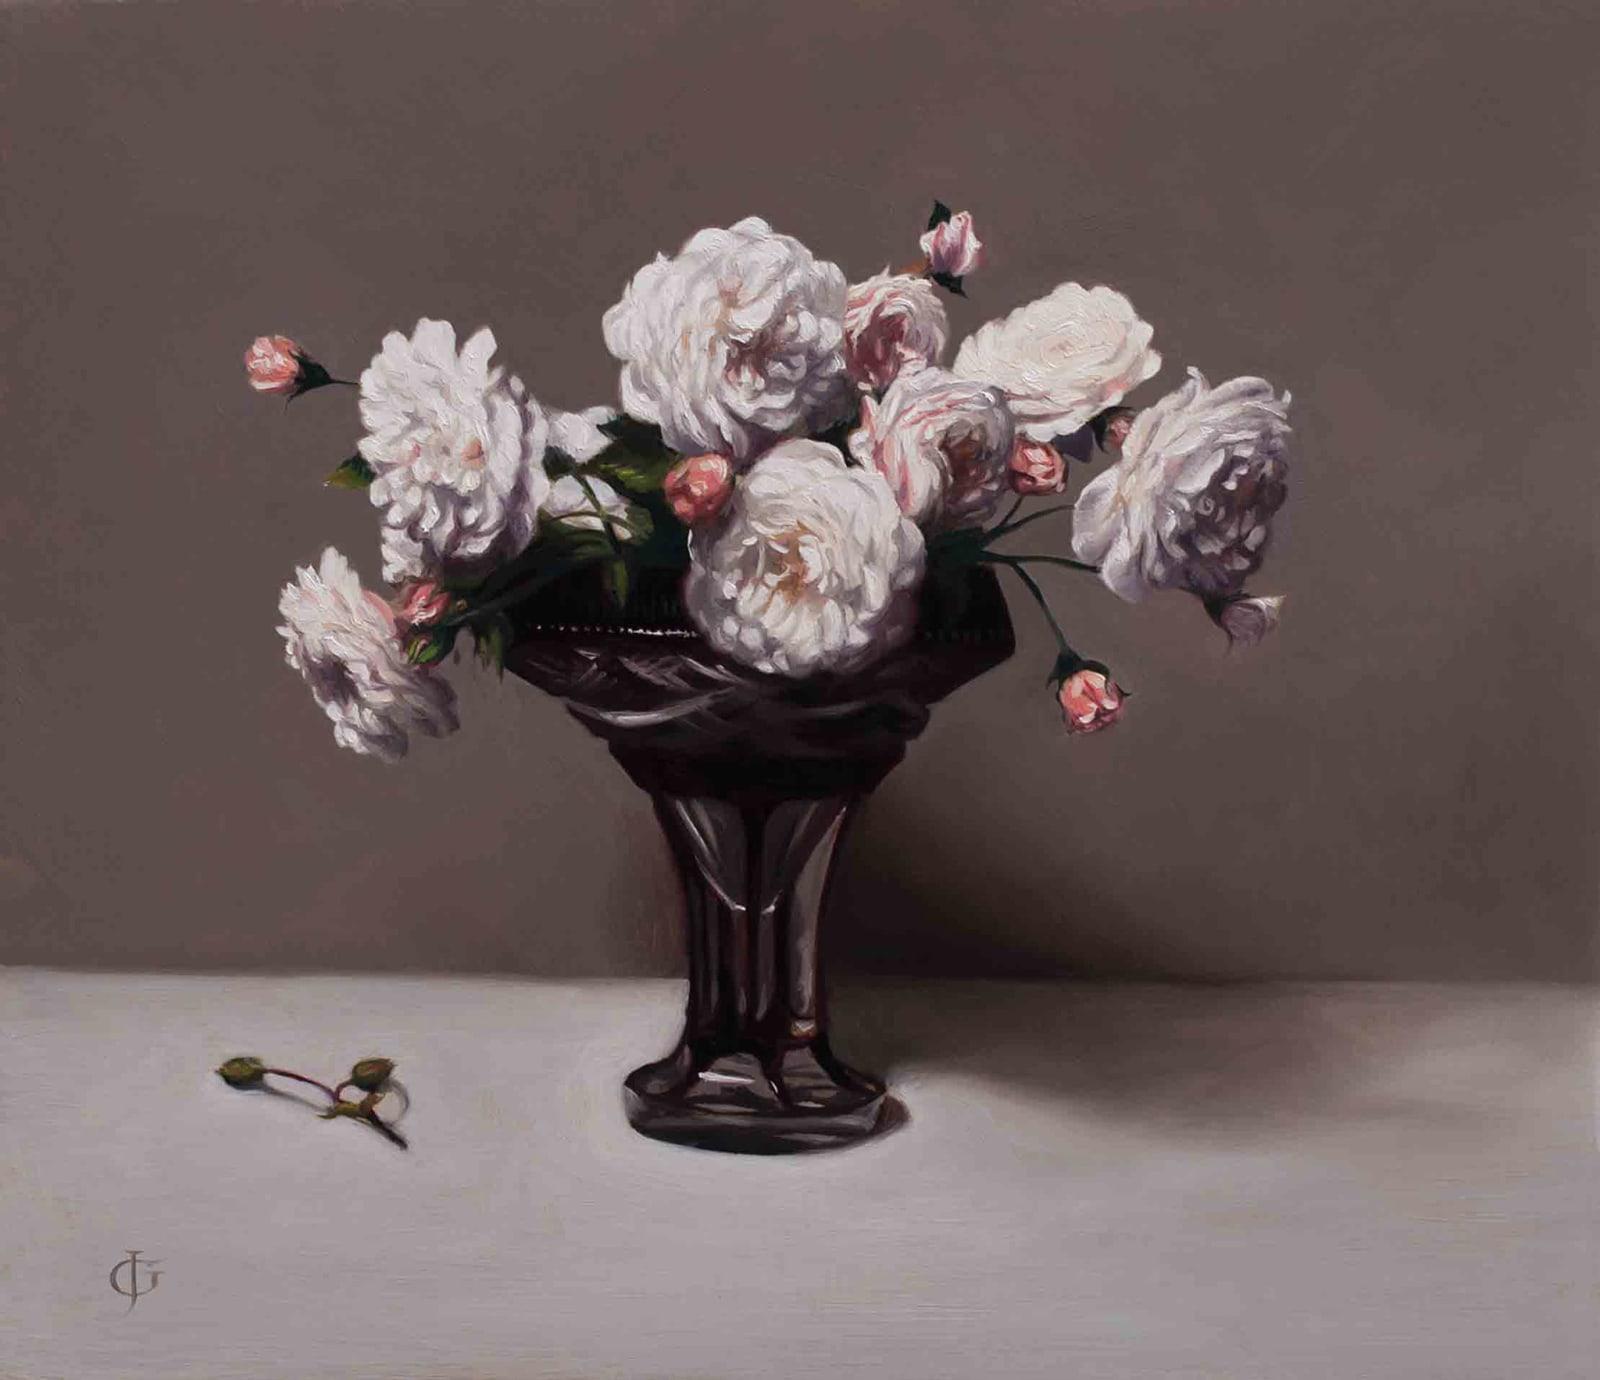 James Gillick, Old English Roses